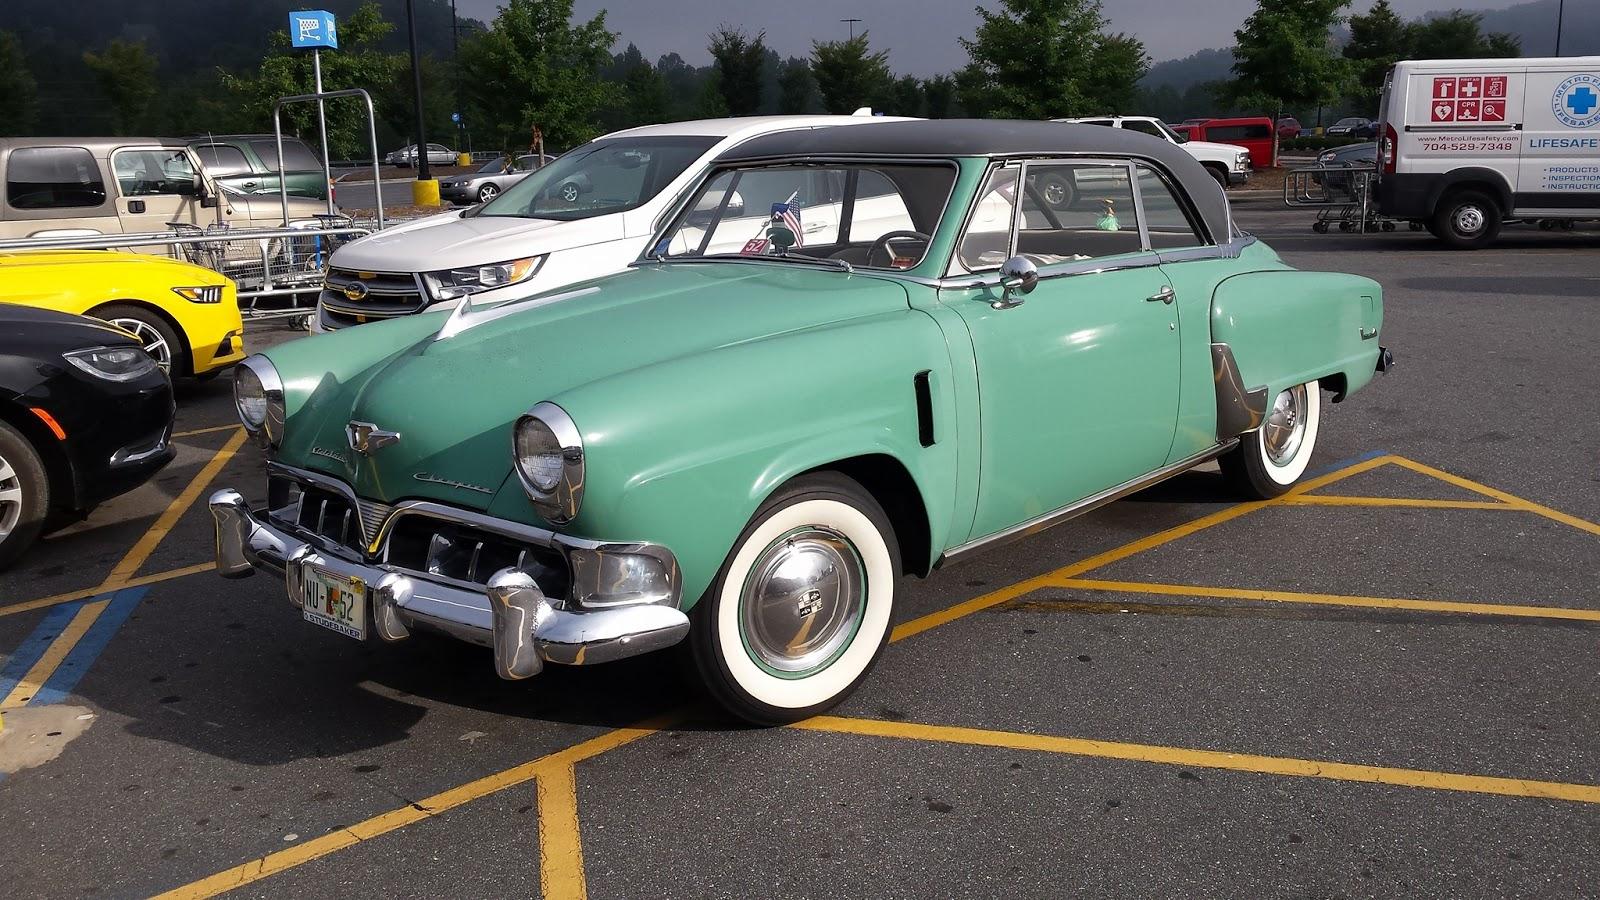 A 1952 Studebaker Champion